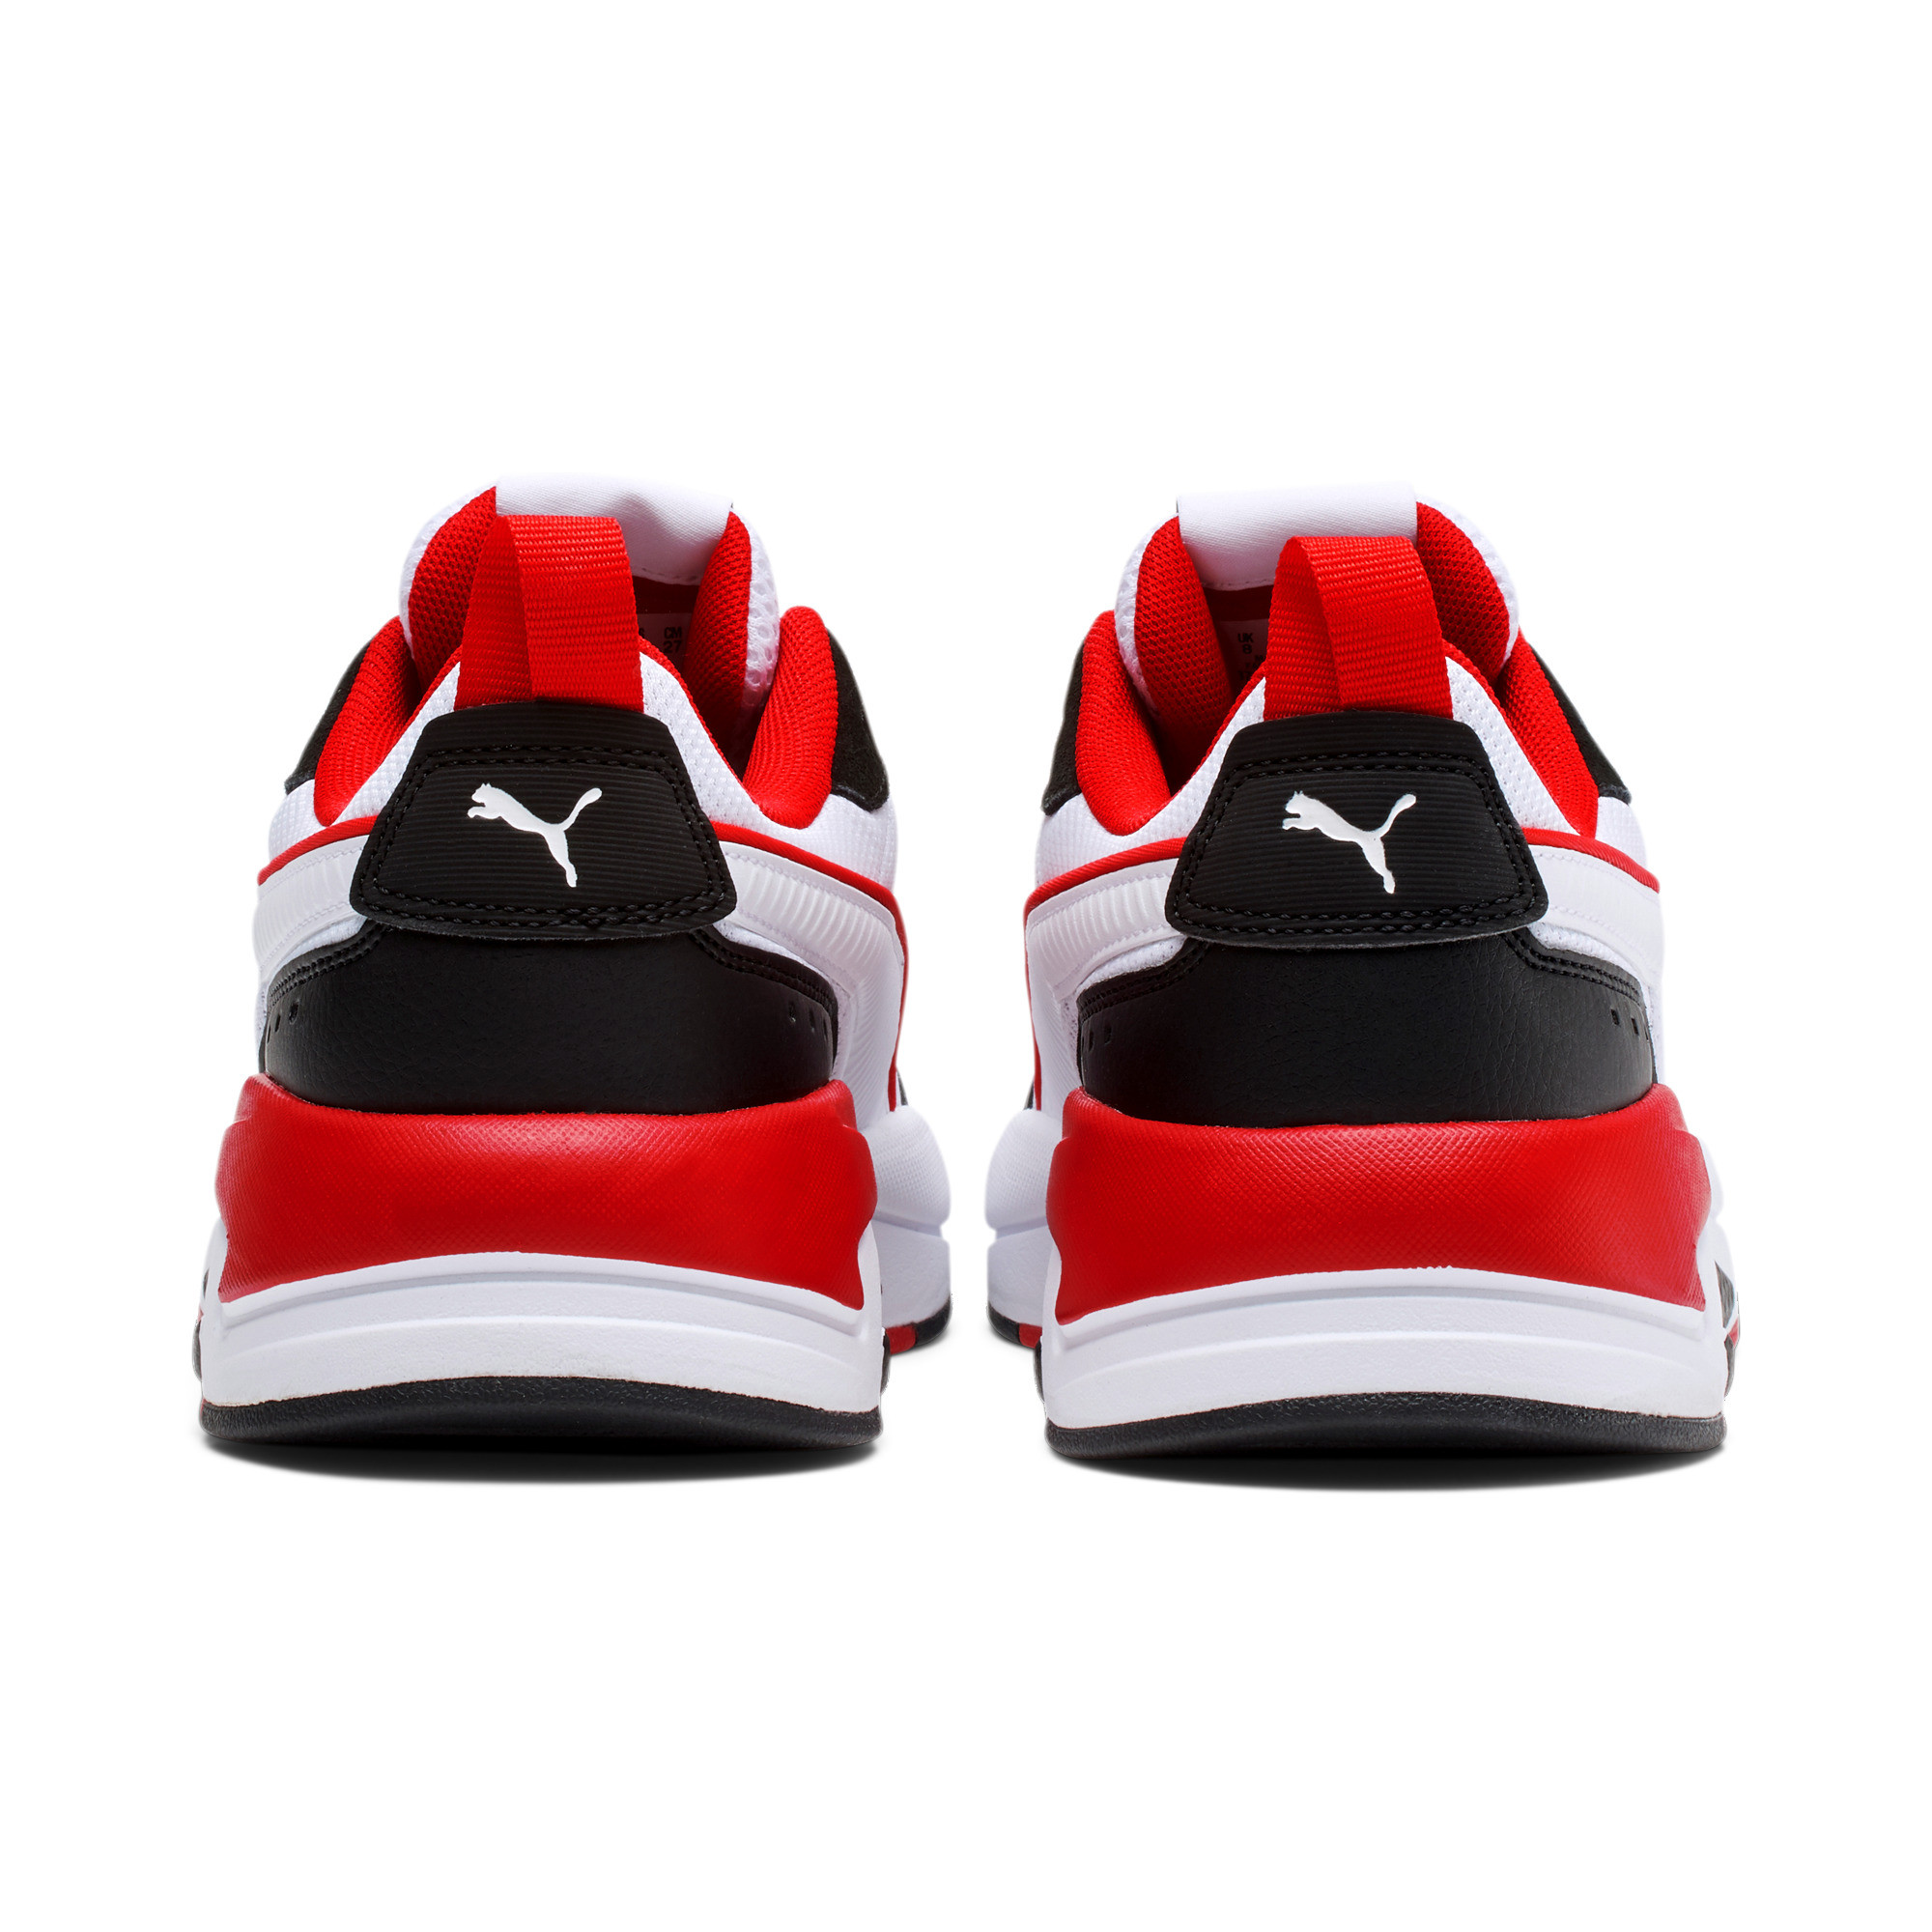 PUMA-Men-039-s-X-RAY-Sneakers thumbnail 31